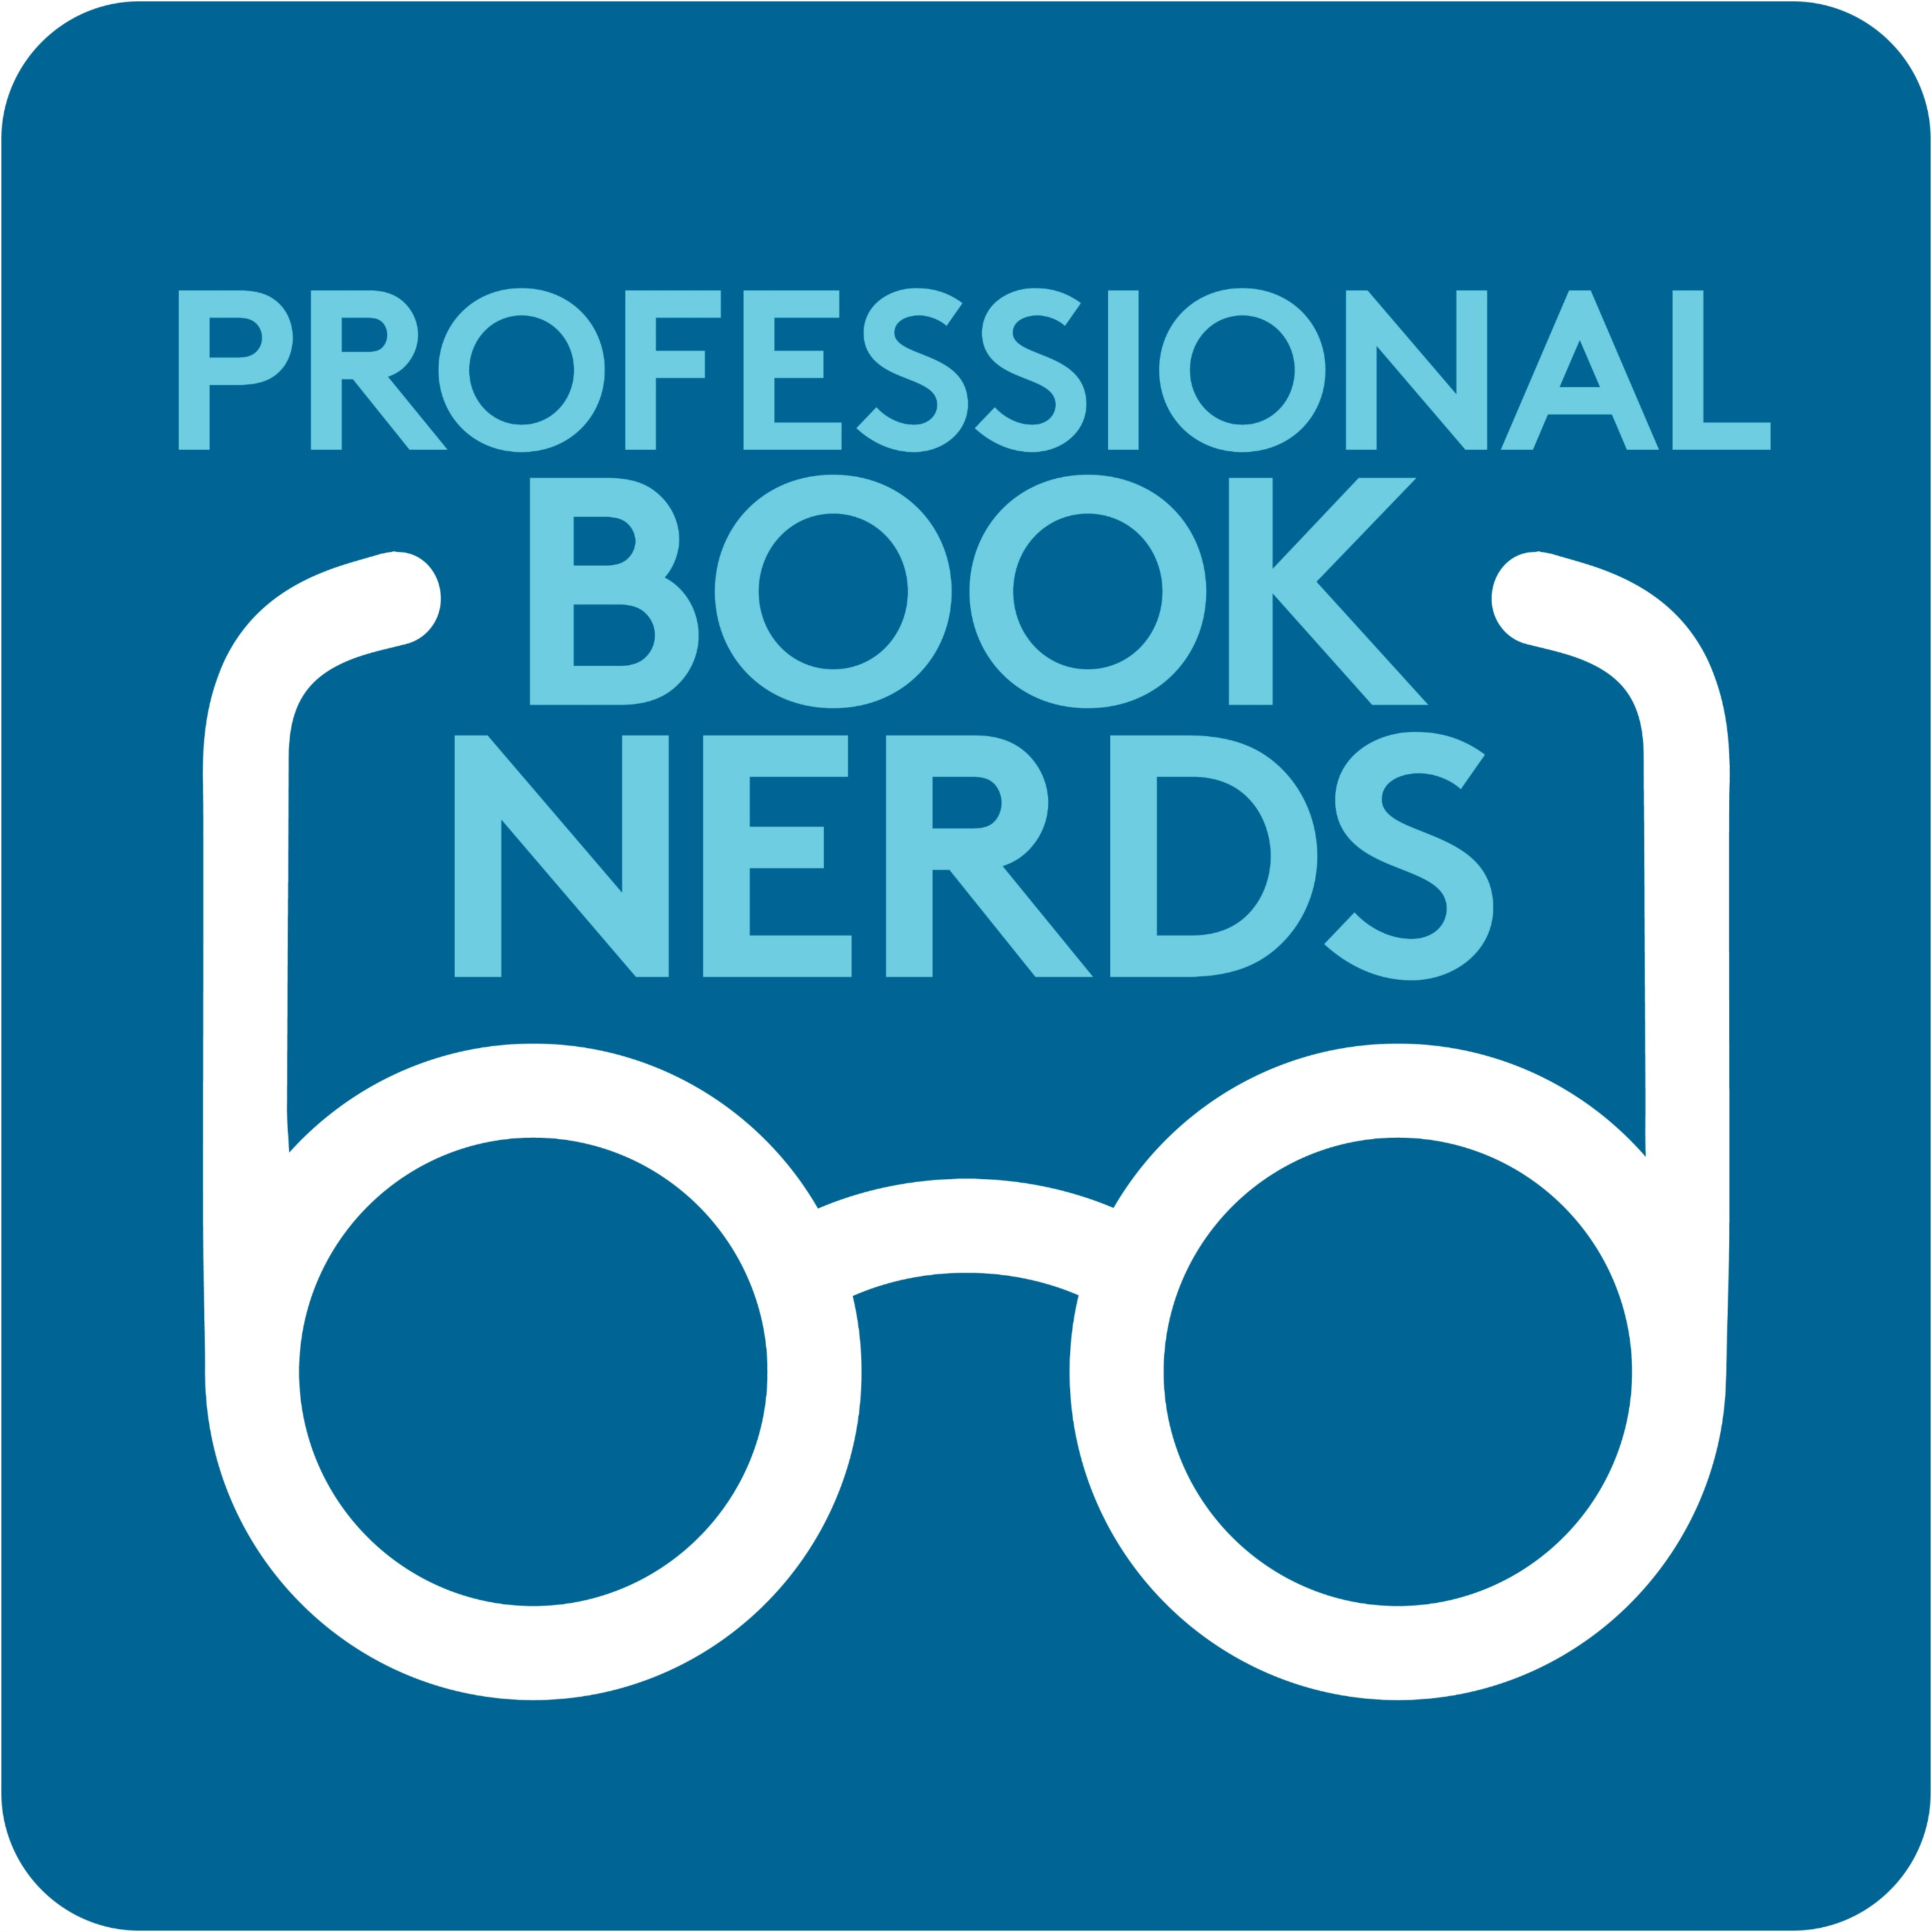 Professional Book Nerds